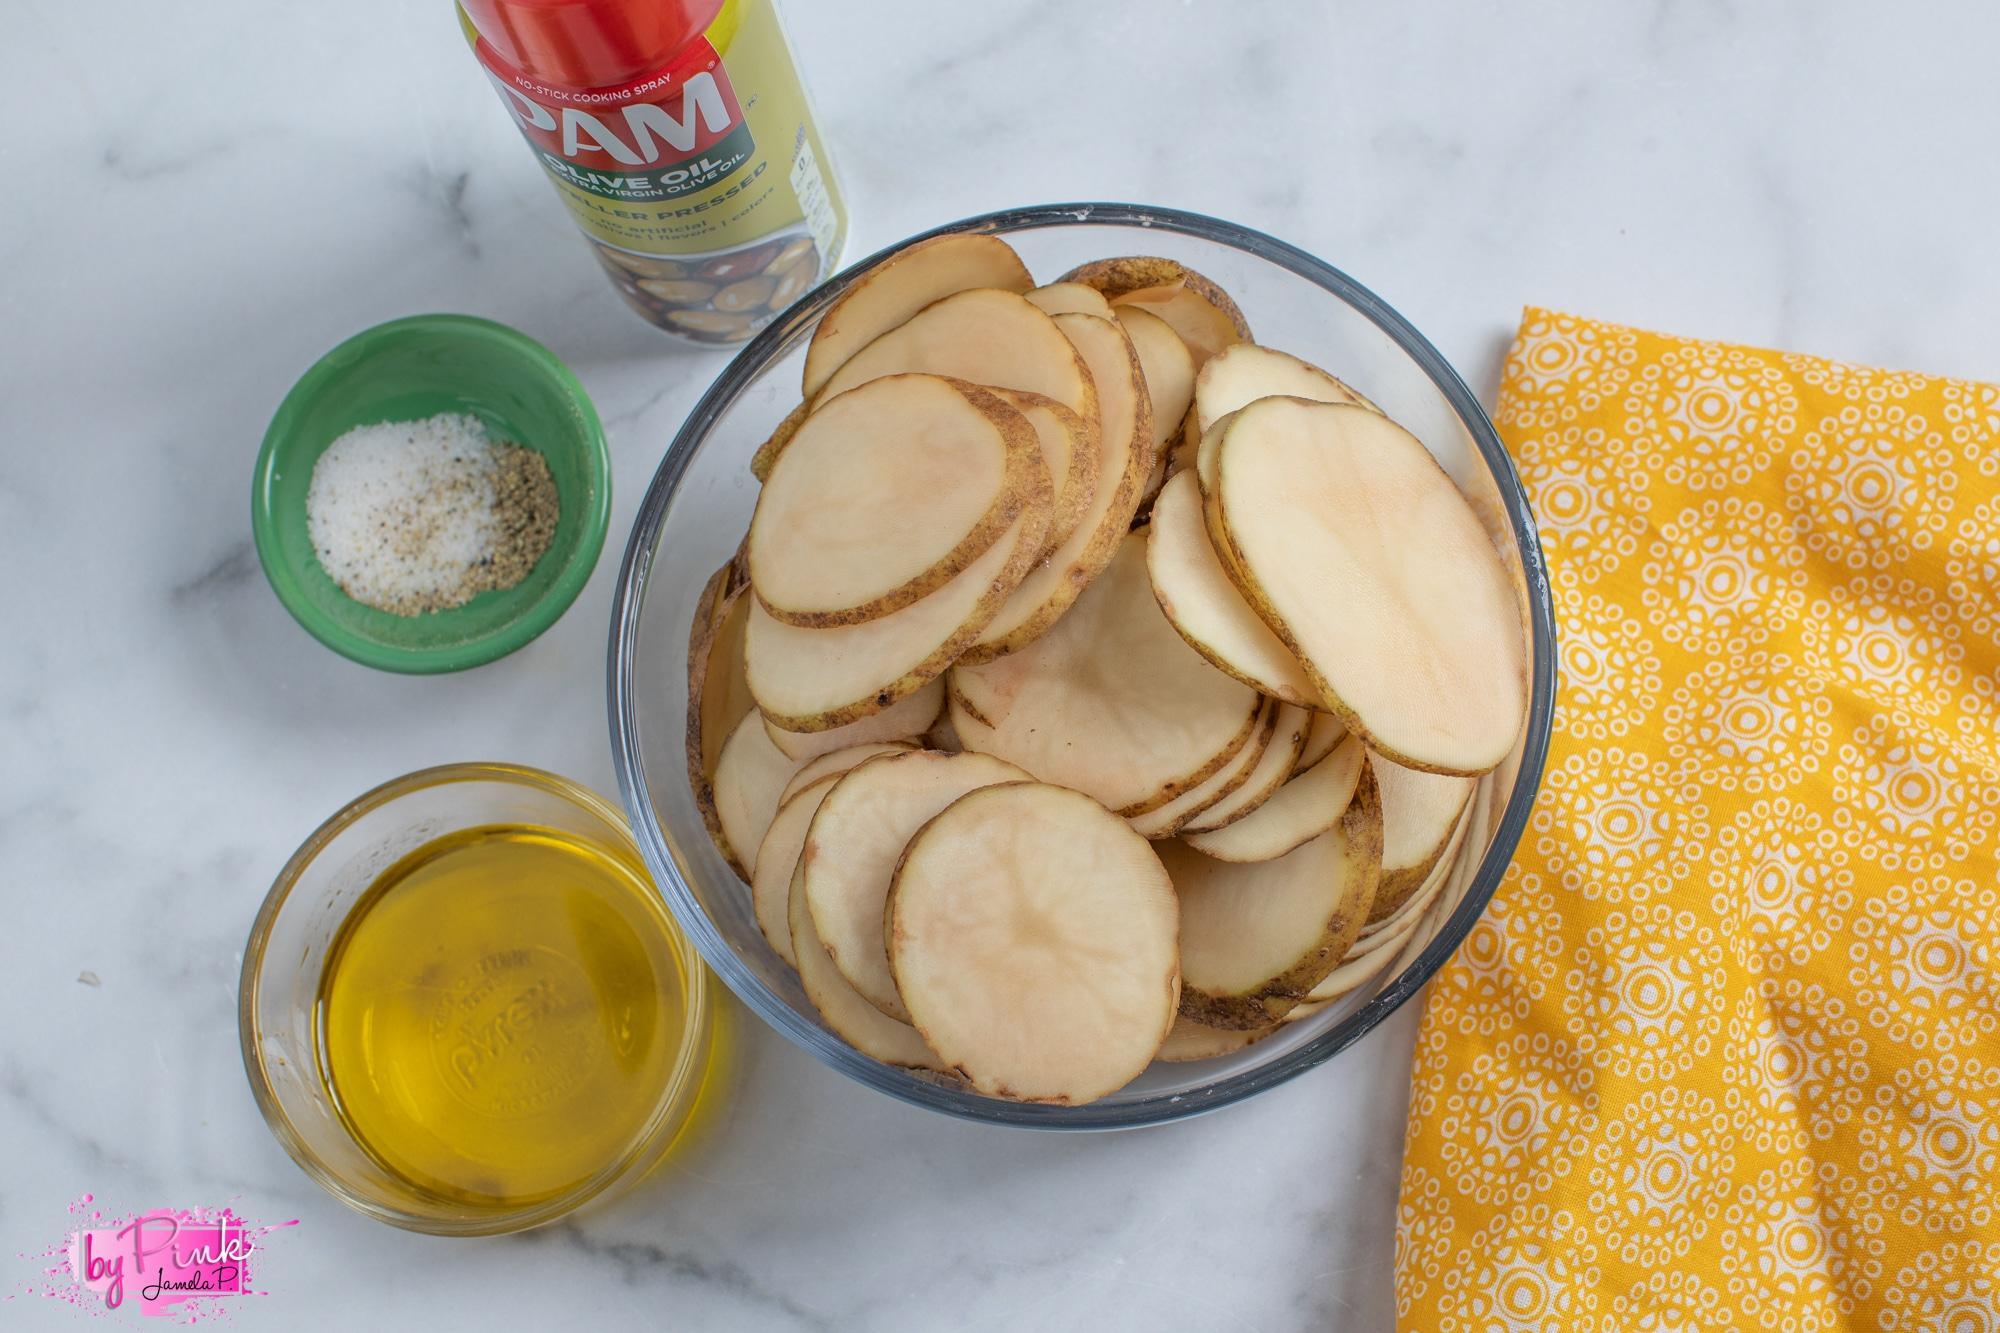 ingredients for air fryer sliced potatoes